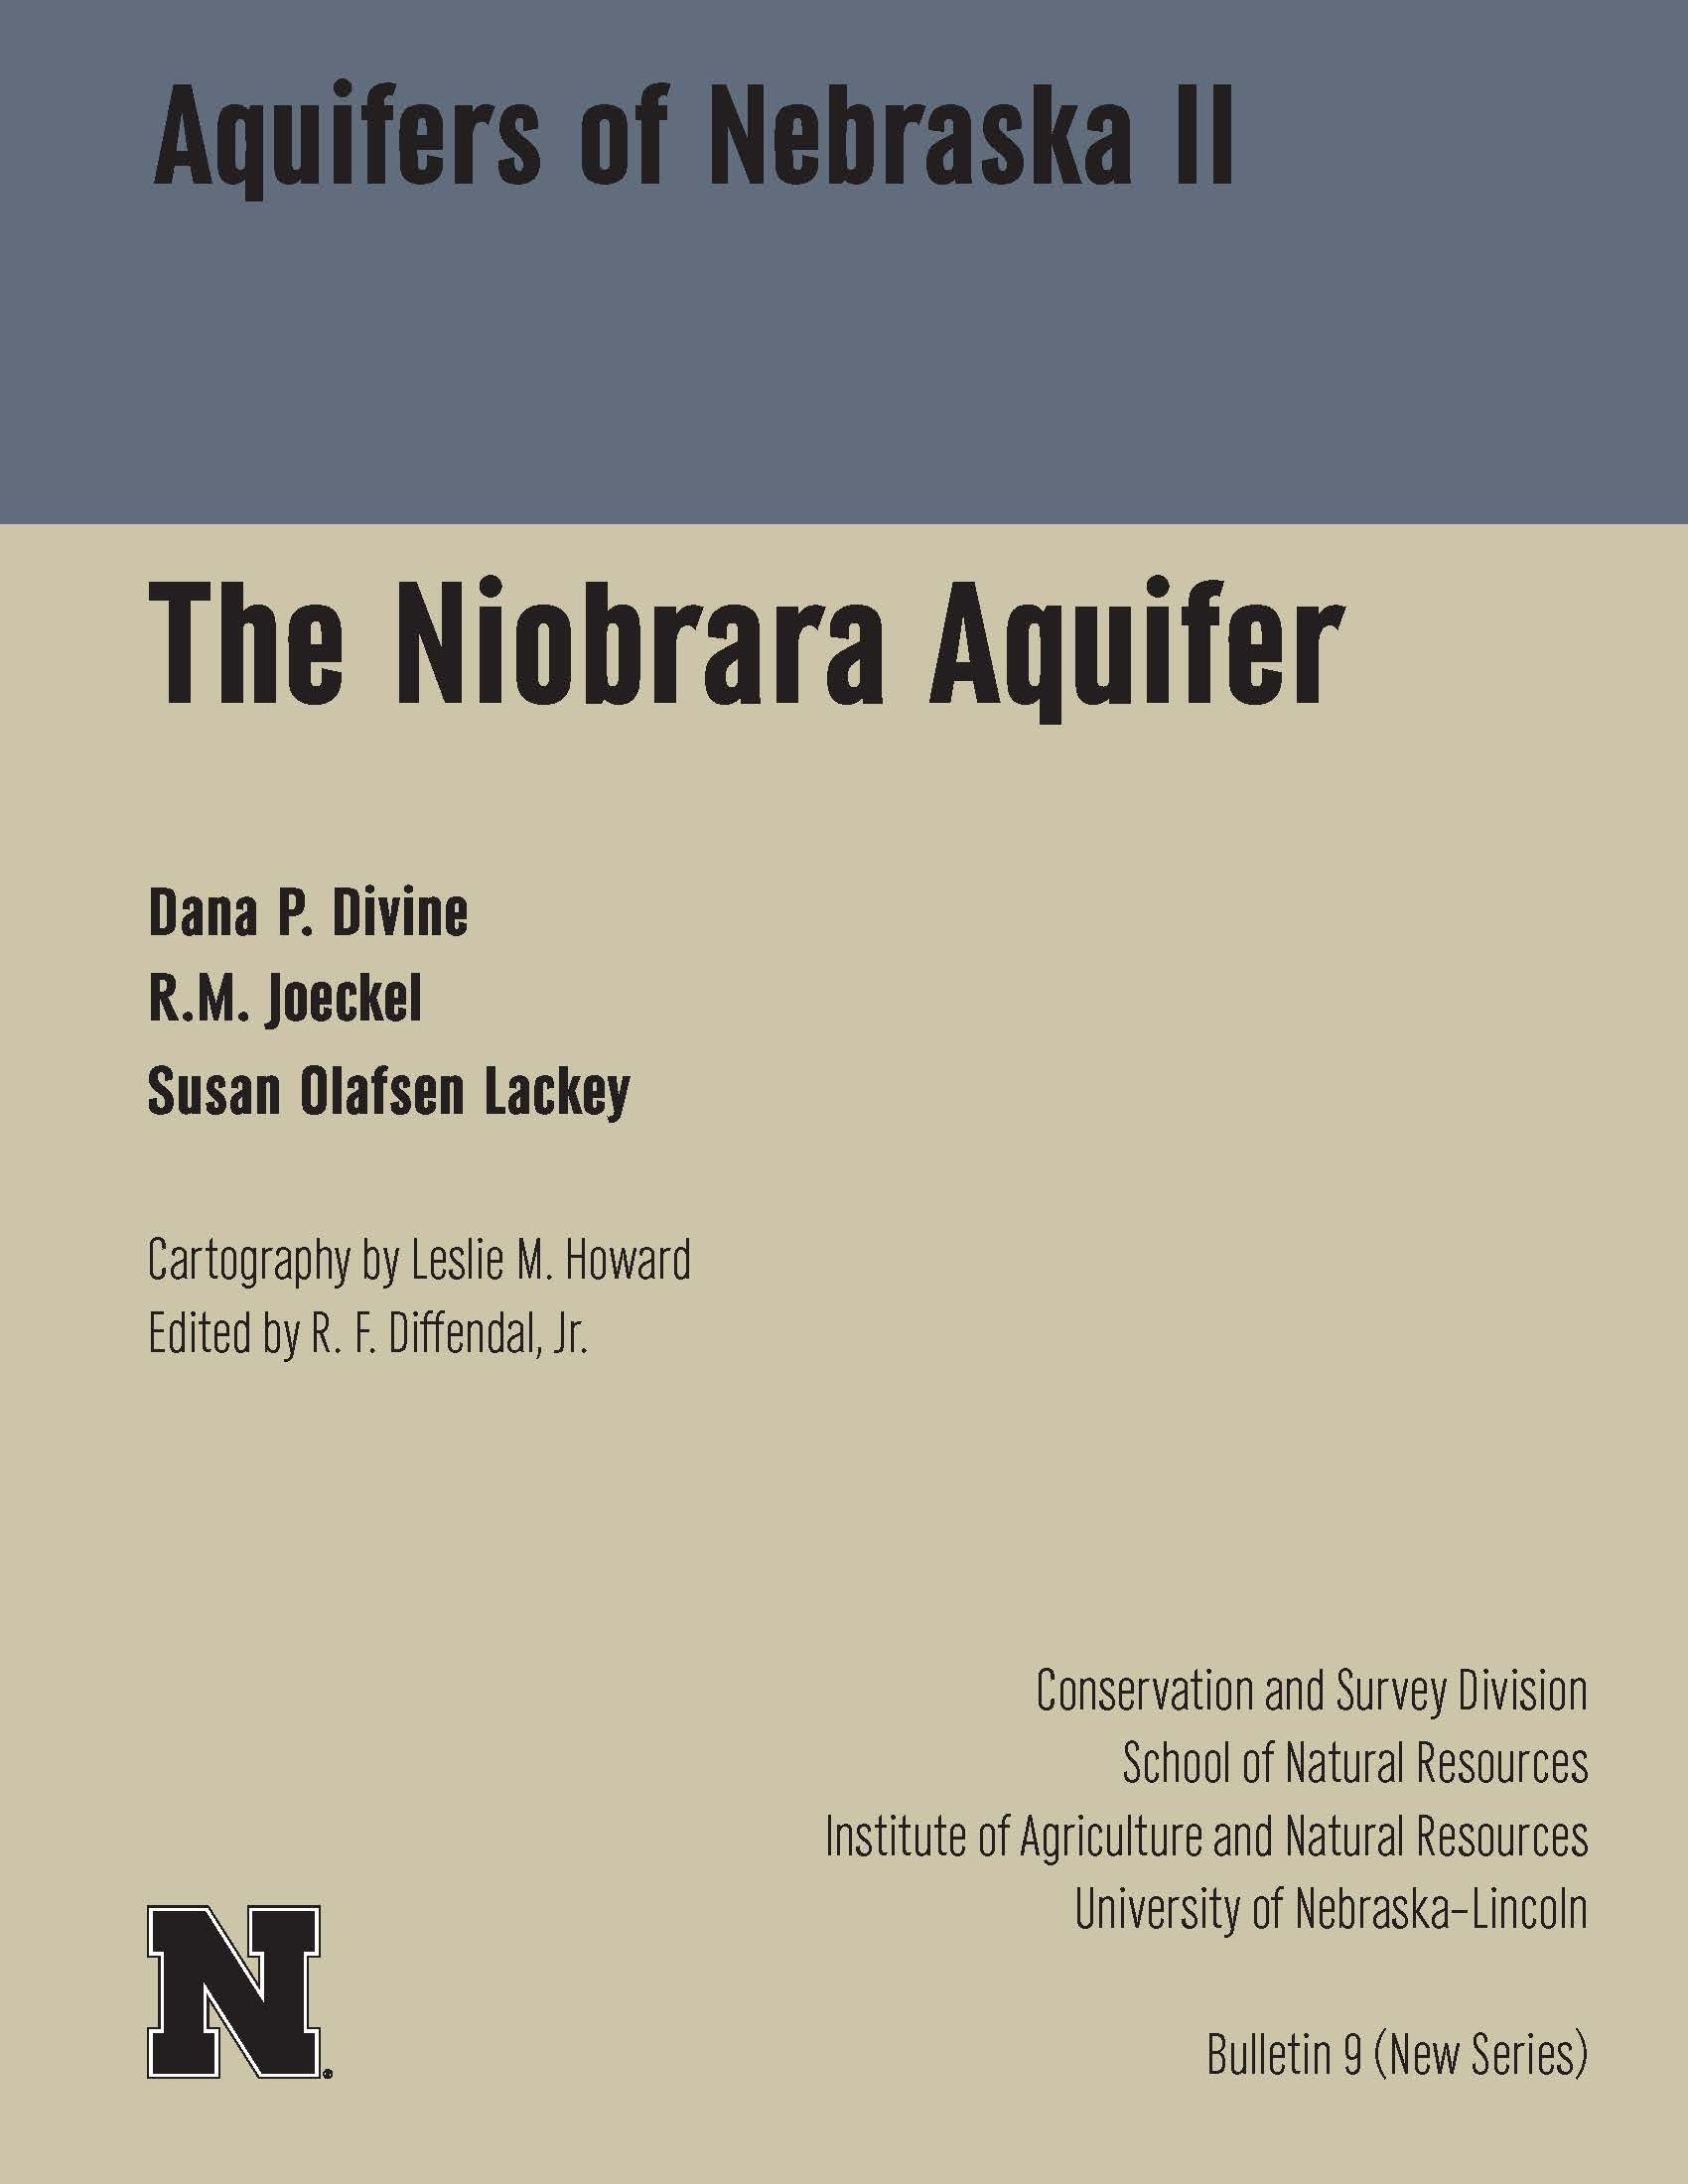 Aquifers of Nebraska II The Niobrara Aquifer CB-9(NS)